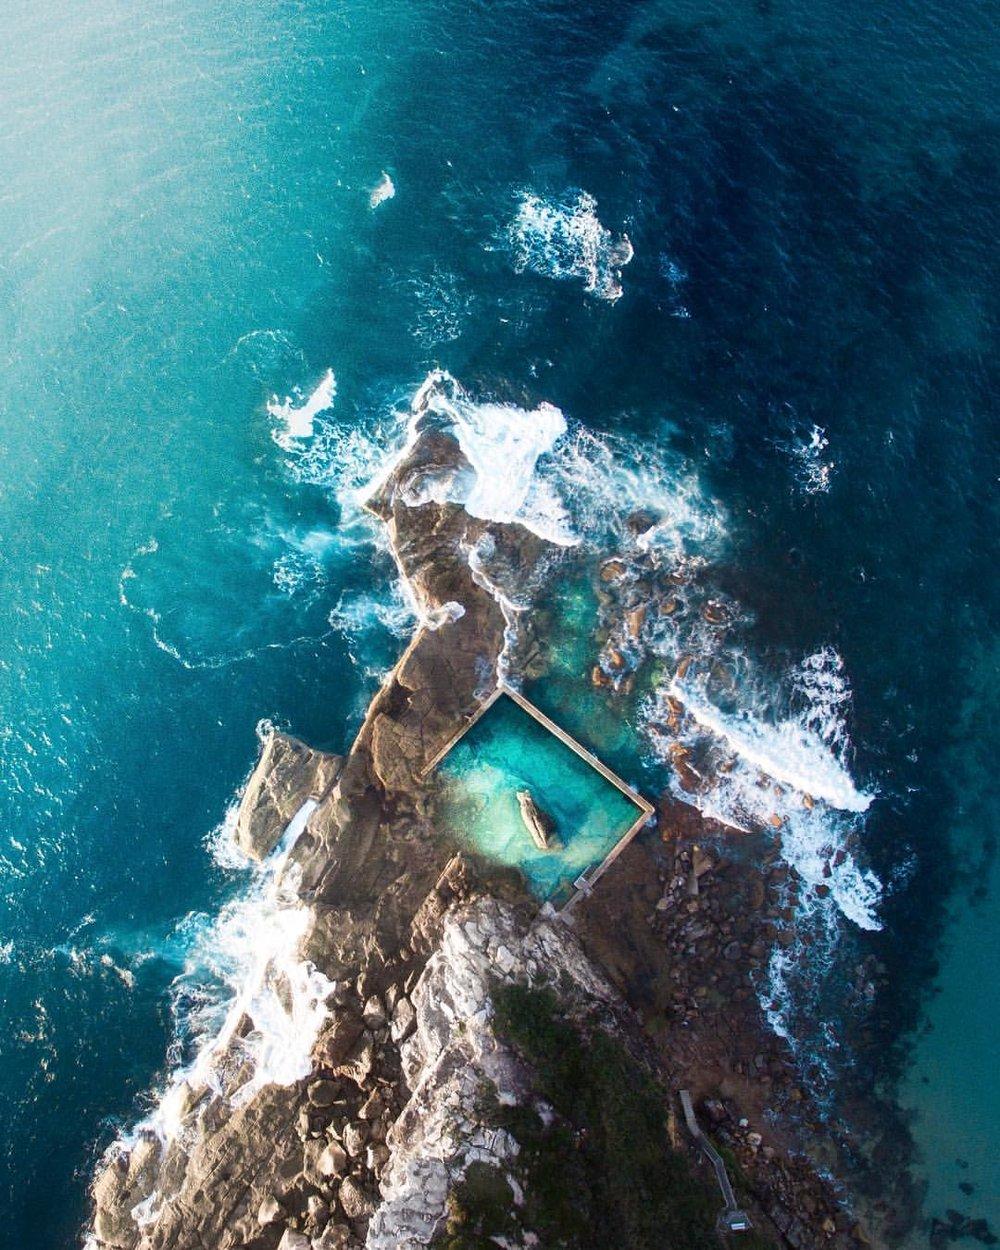 Gab Scanu Mona Vale Beach Drone Shot2.jpg